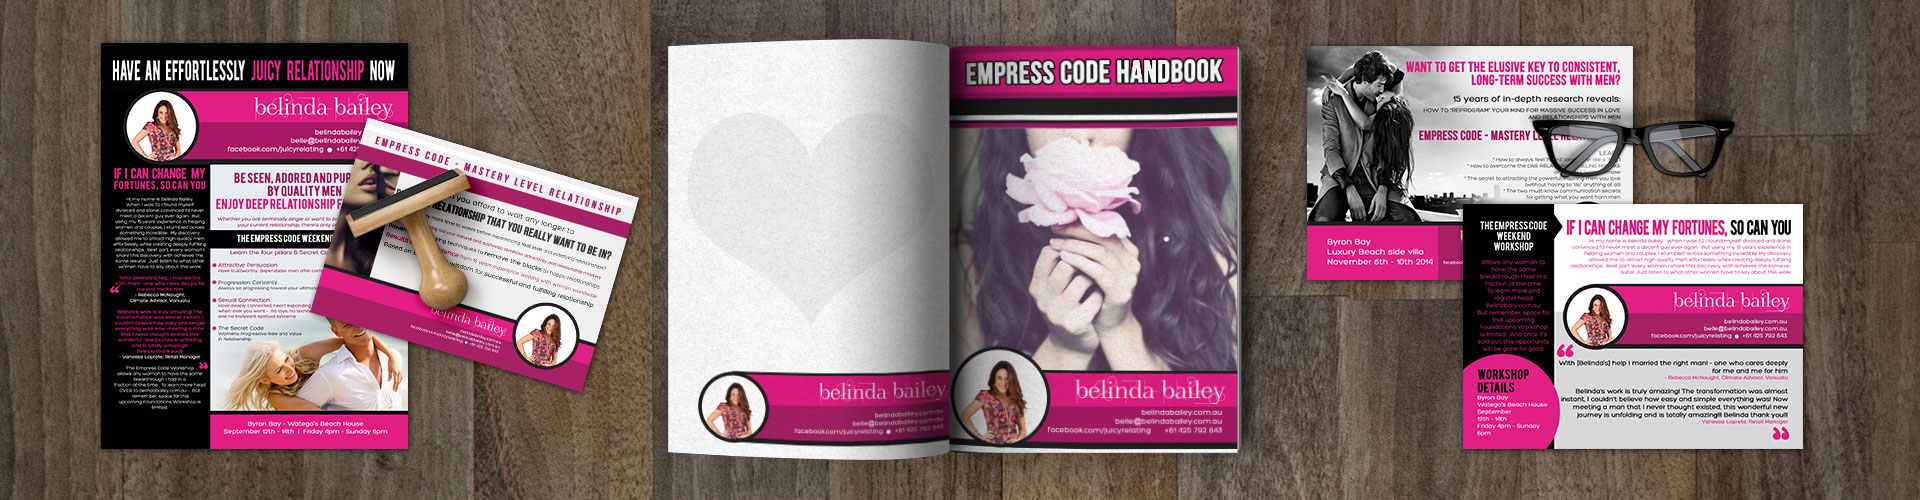 Belinda-bailey-banner